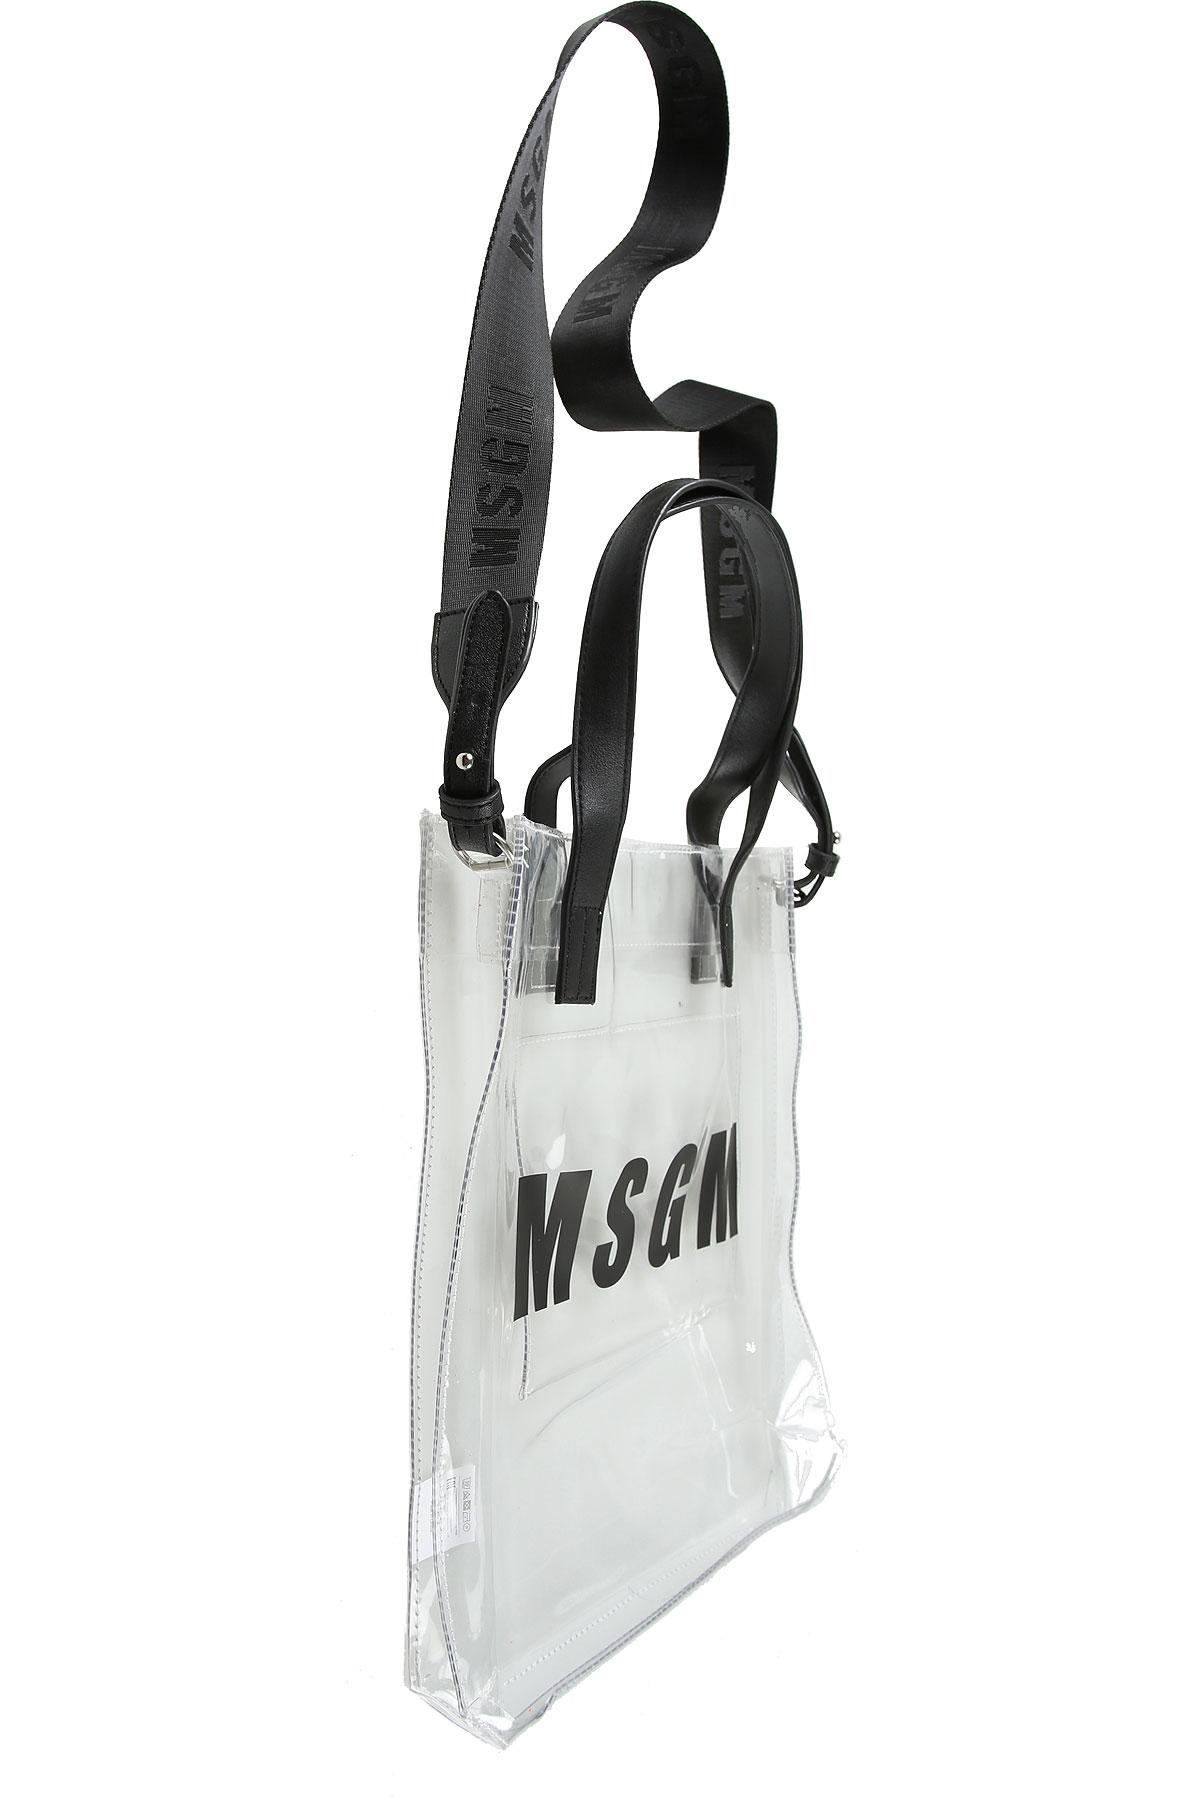 MSGM Sac à Main Fille, Transparent, PVC, 2017